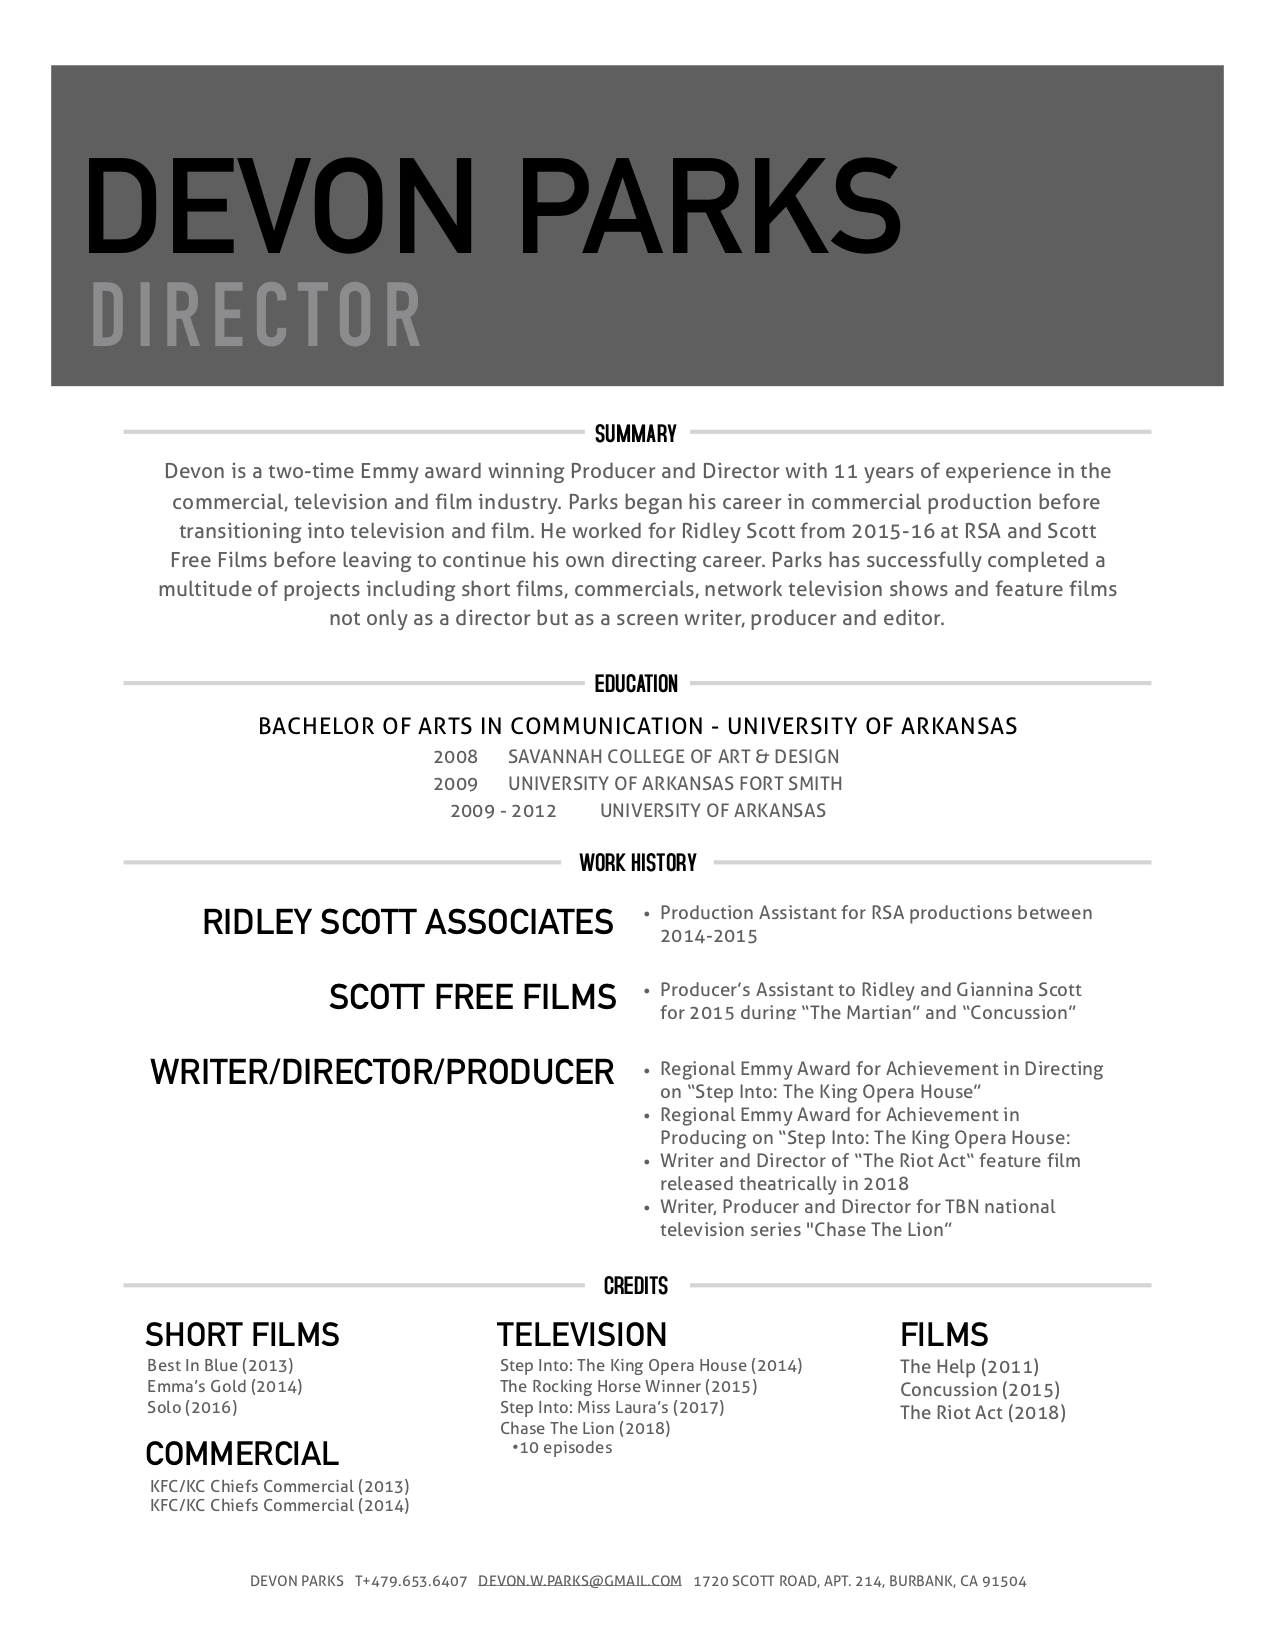 Director Resume.jpg